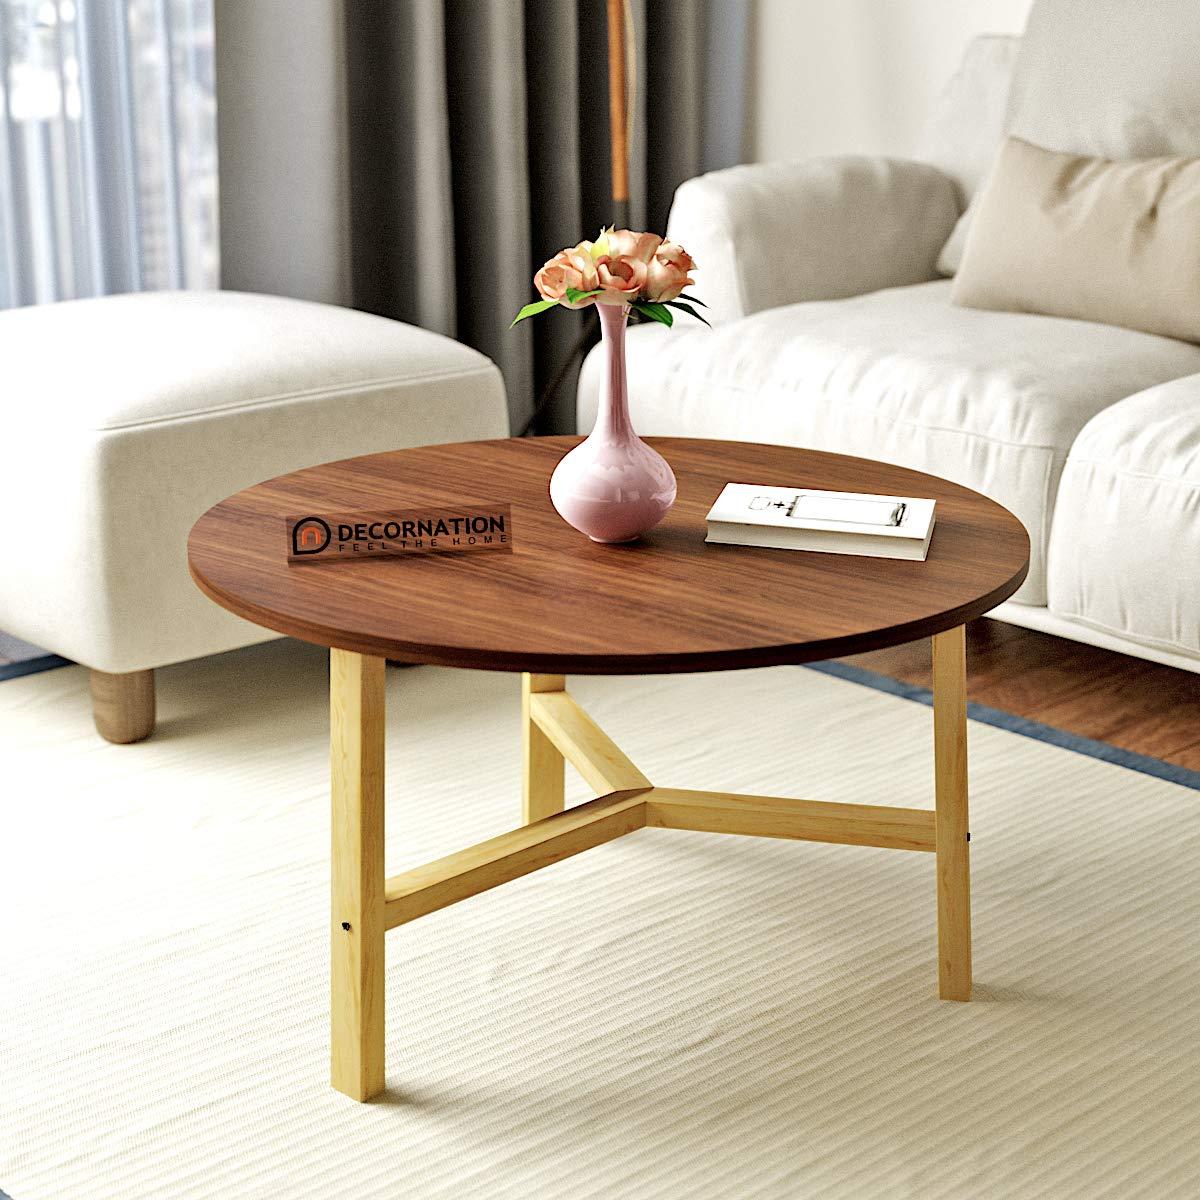 Decornation Millie Wooden Mdf Round Coffee Table With Sturdy Wood Base Walnut Amazon In Home Kitchen